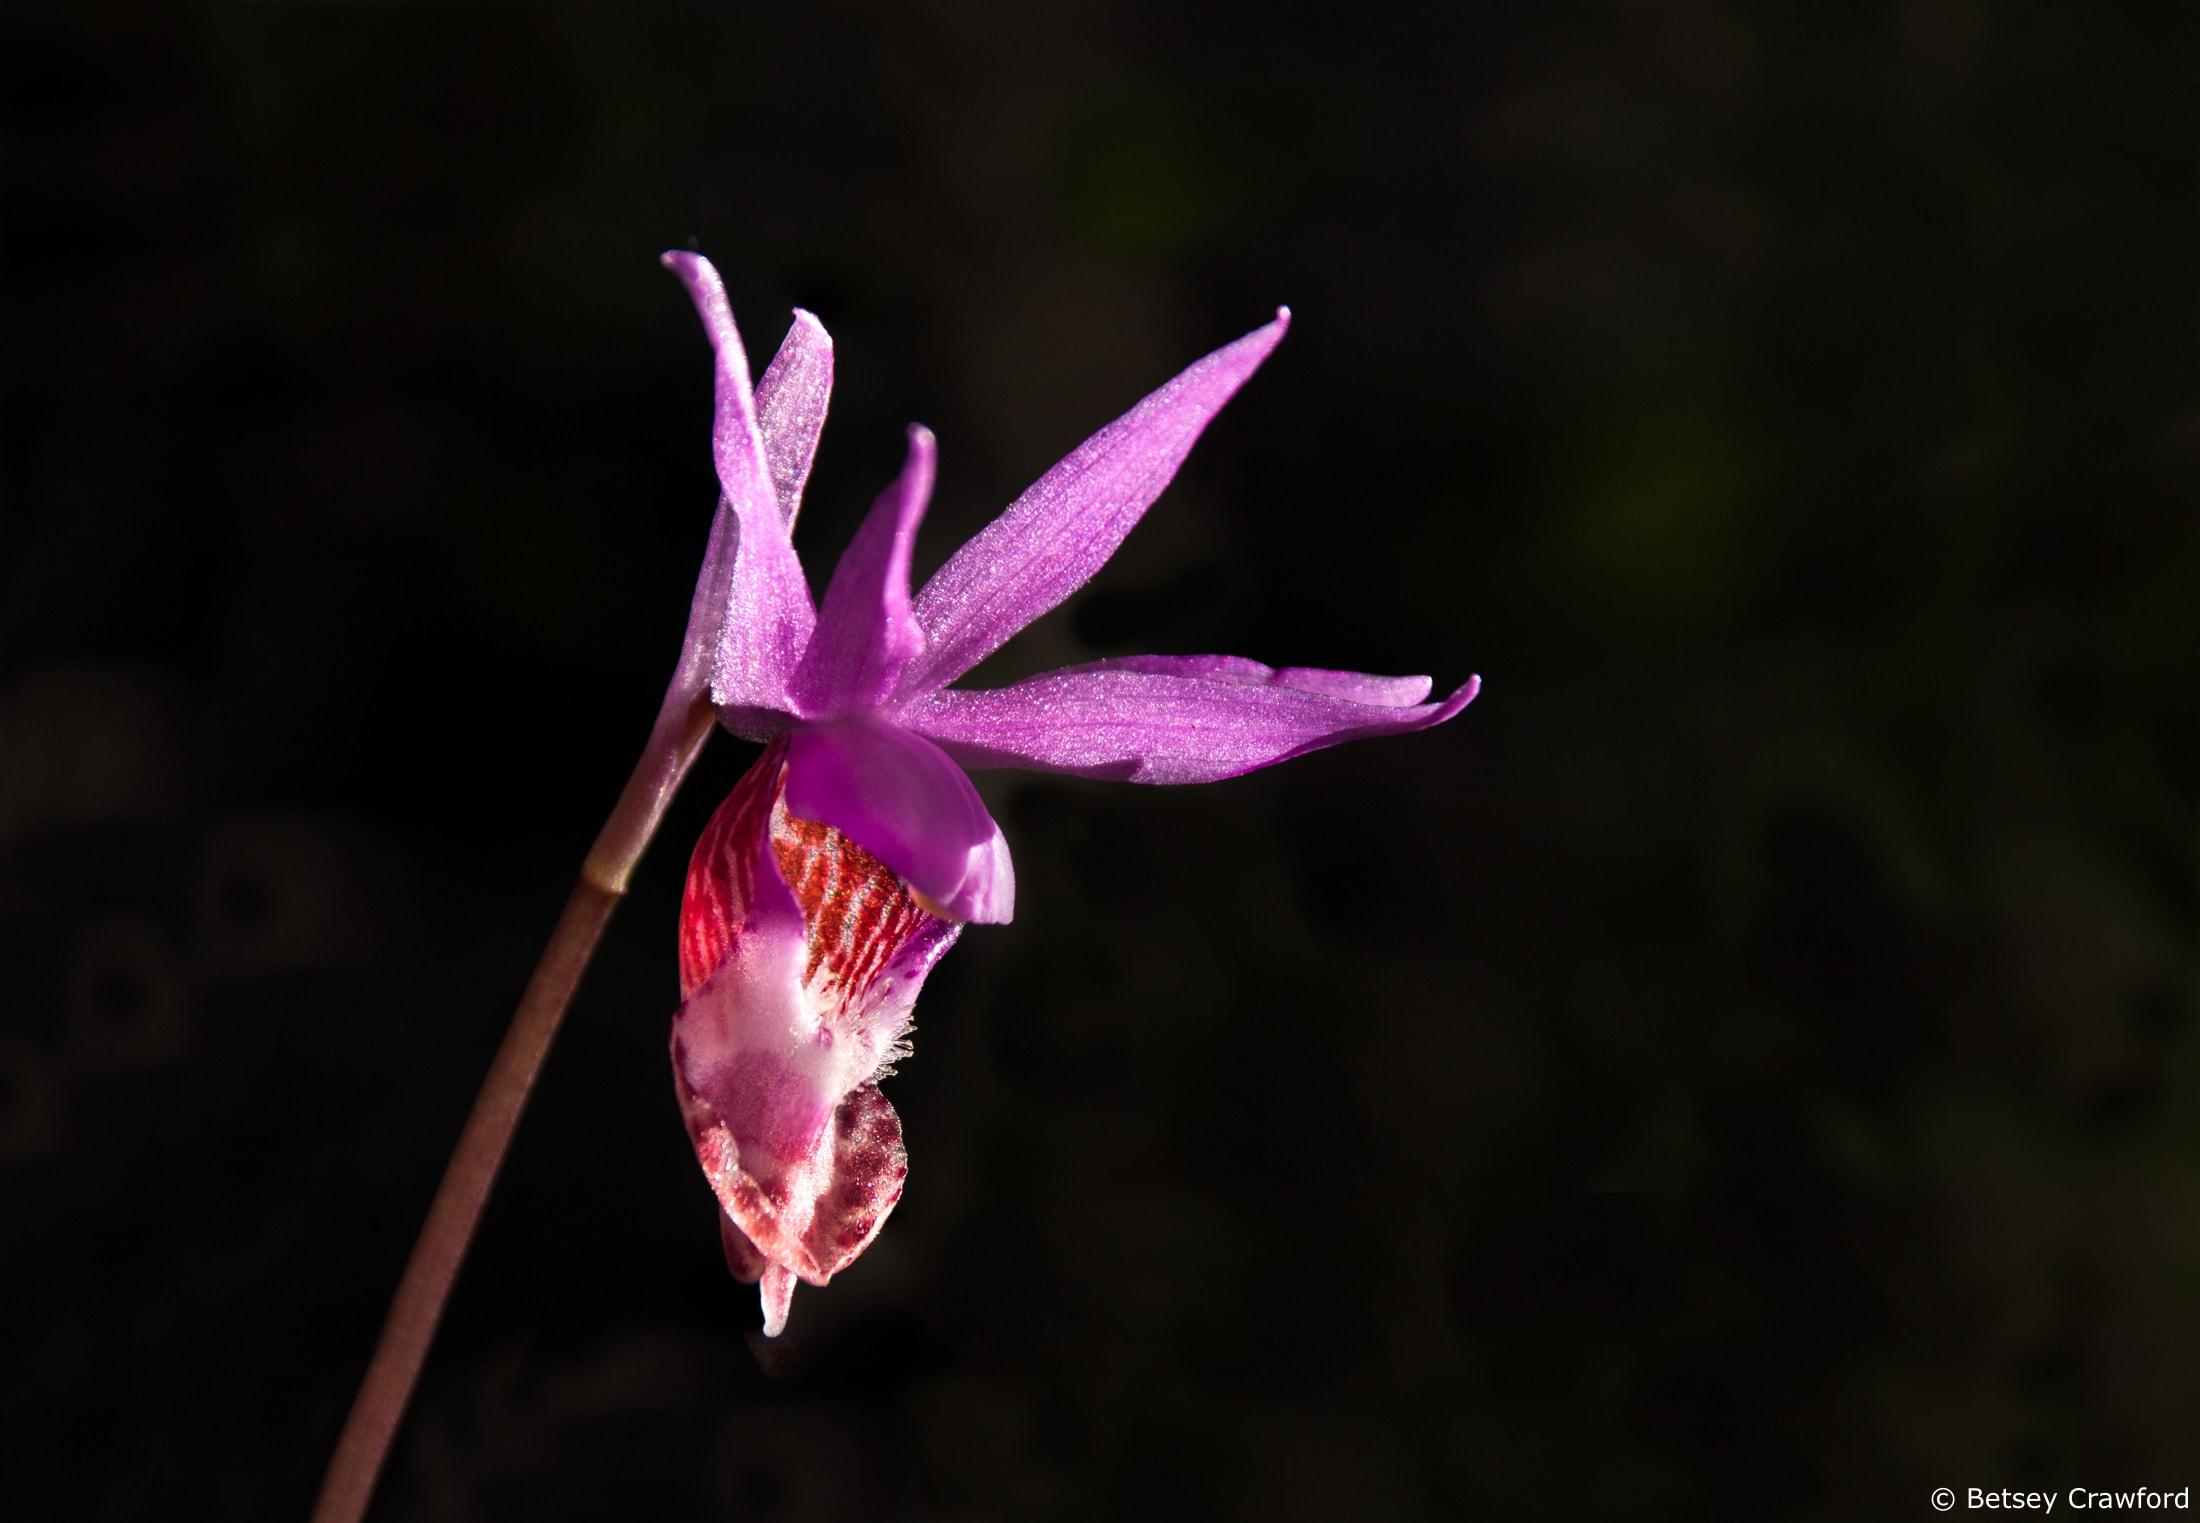 Fairy slipper orchid (Calypso balboa) in Mount Tamalpais State Park, Mill Valley, California